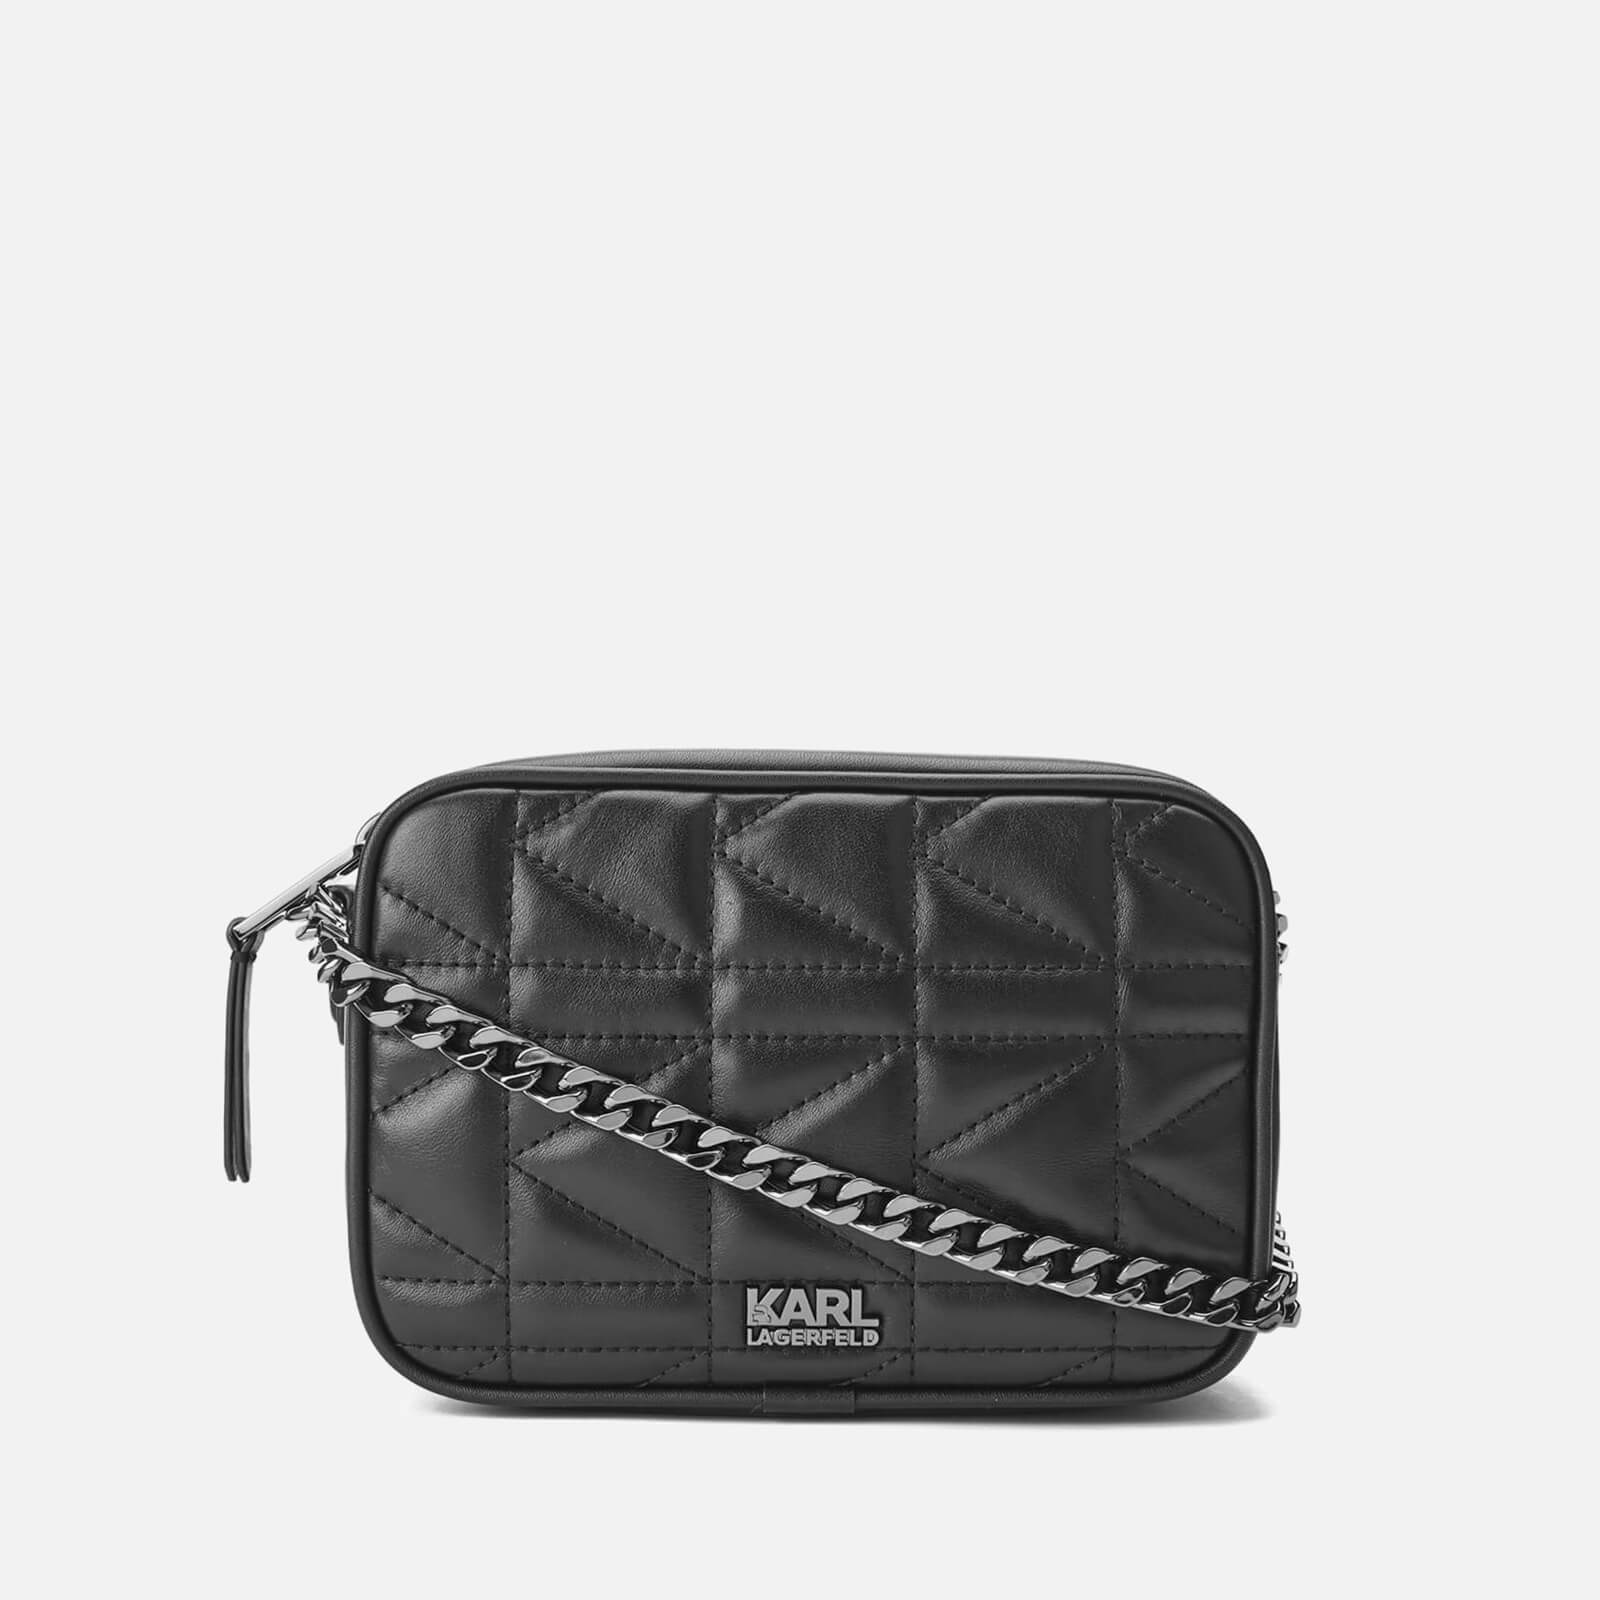 2da23dbd84fb Karl Lagerfeld Women s K Kuilted Small Cross Body Bag - Black Black - Free  UK Delivery over £50